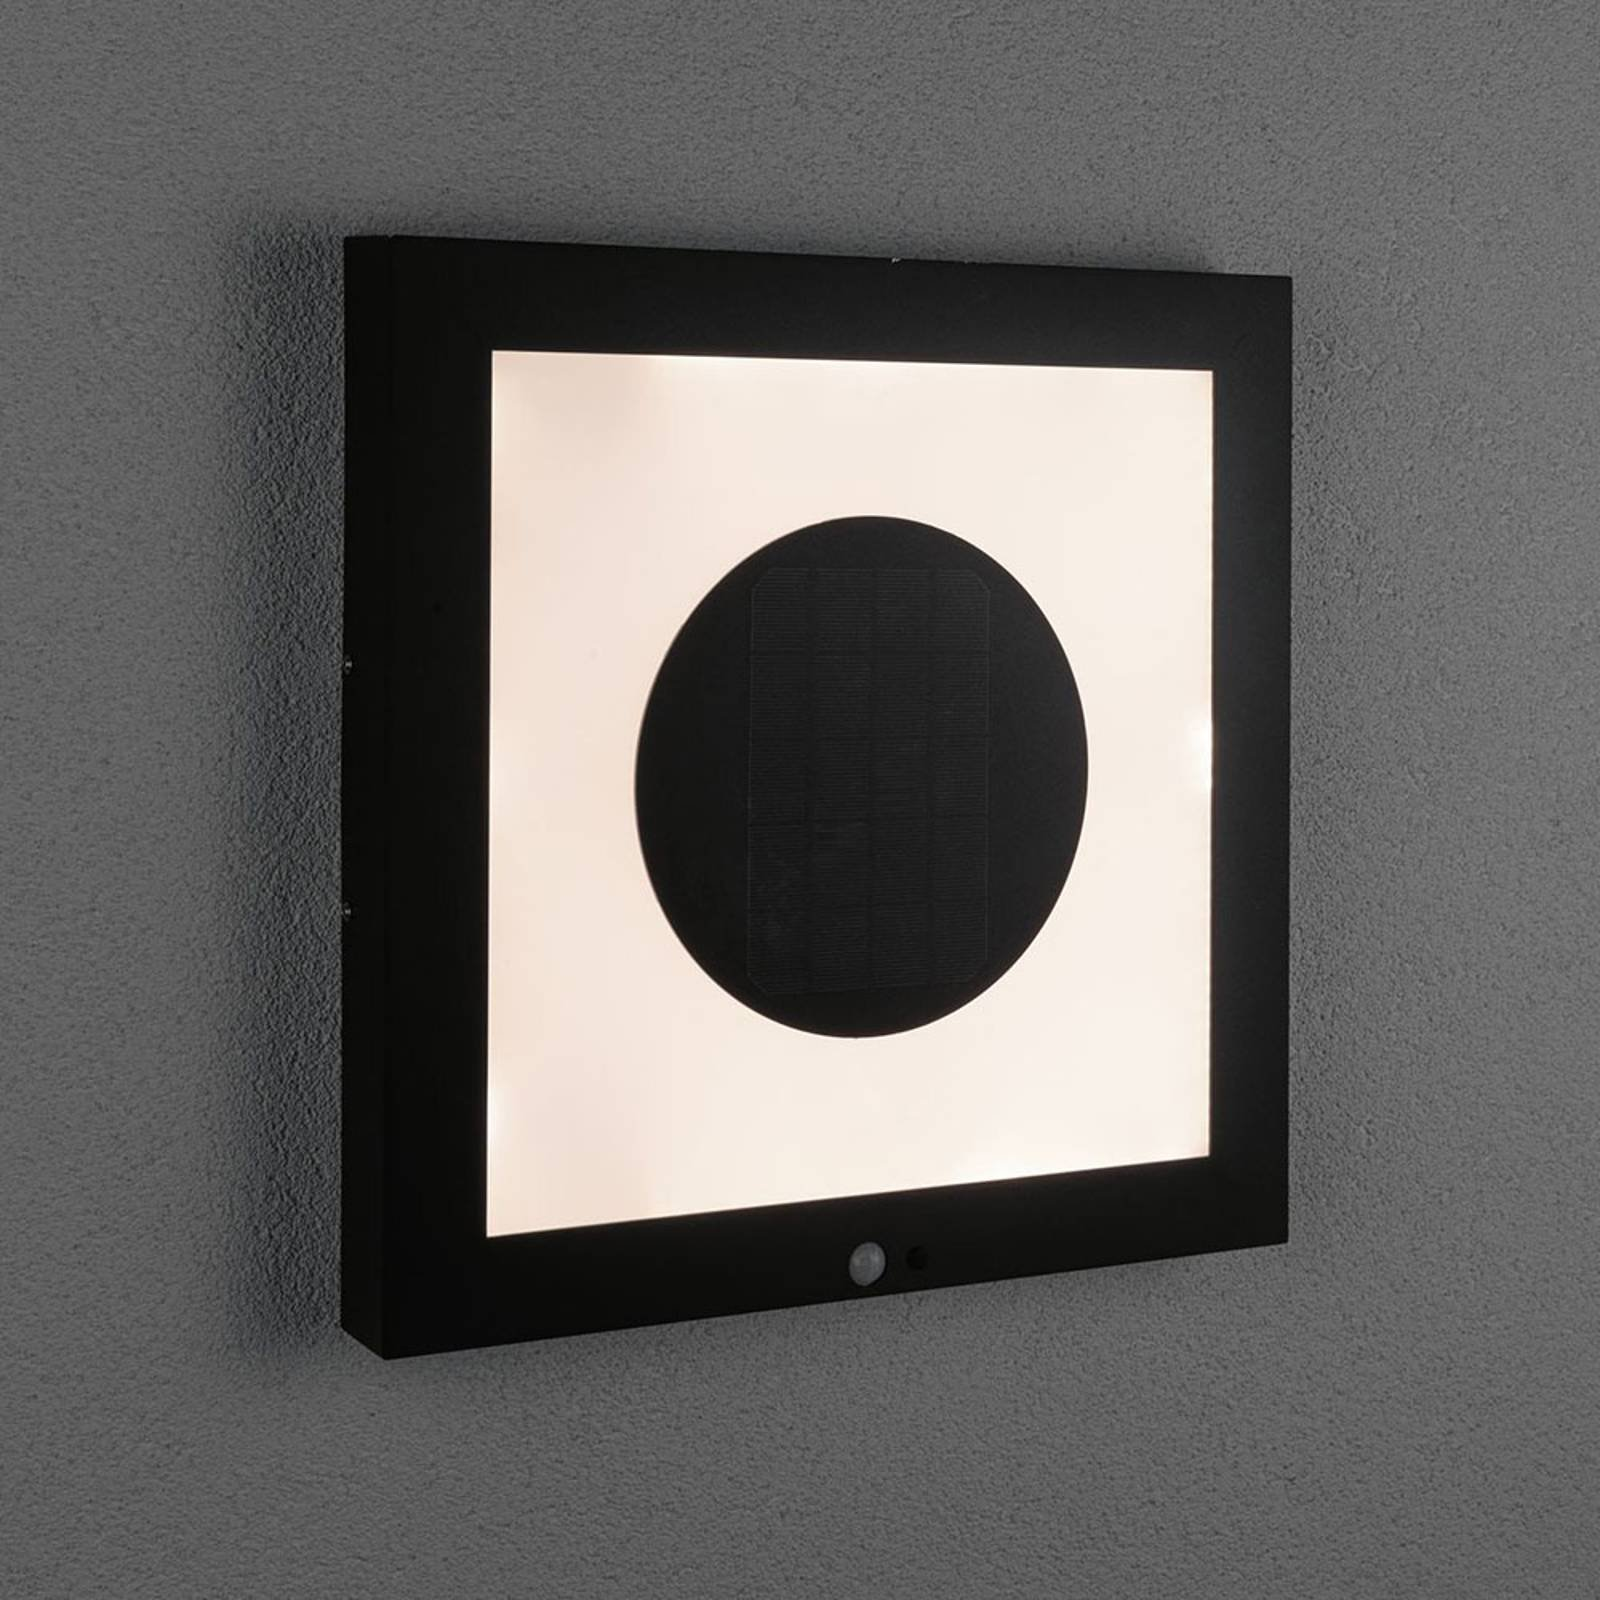 Paulmann LED-solcellepanel Taija sensor 40 x 40 cm